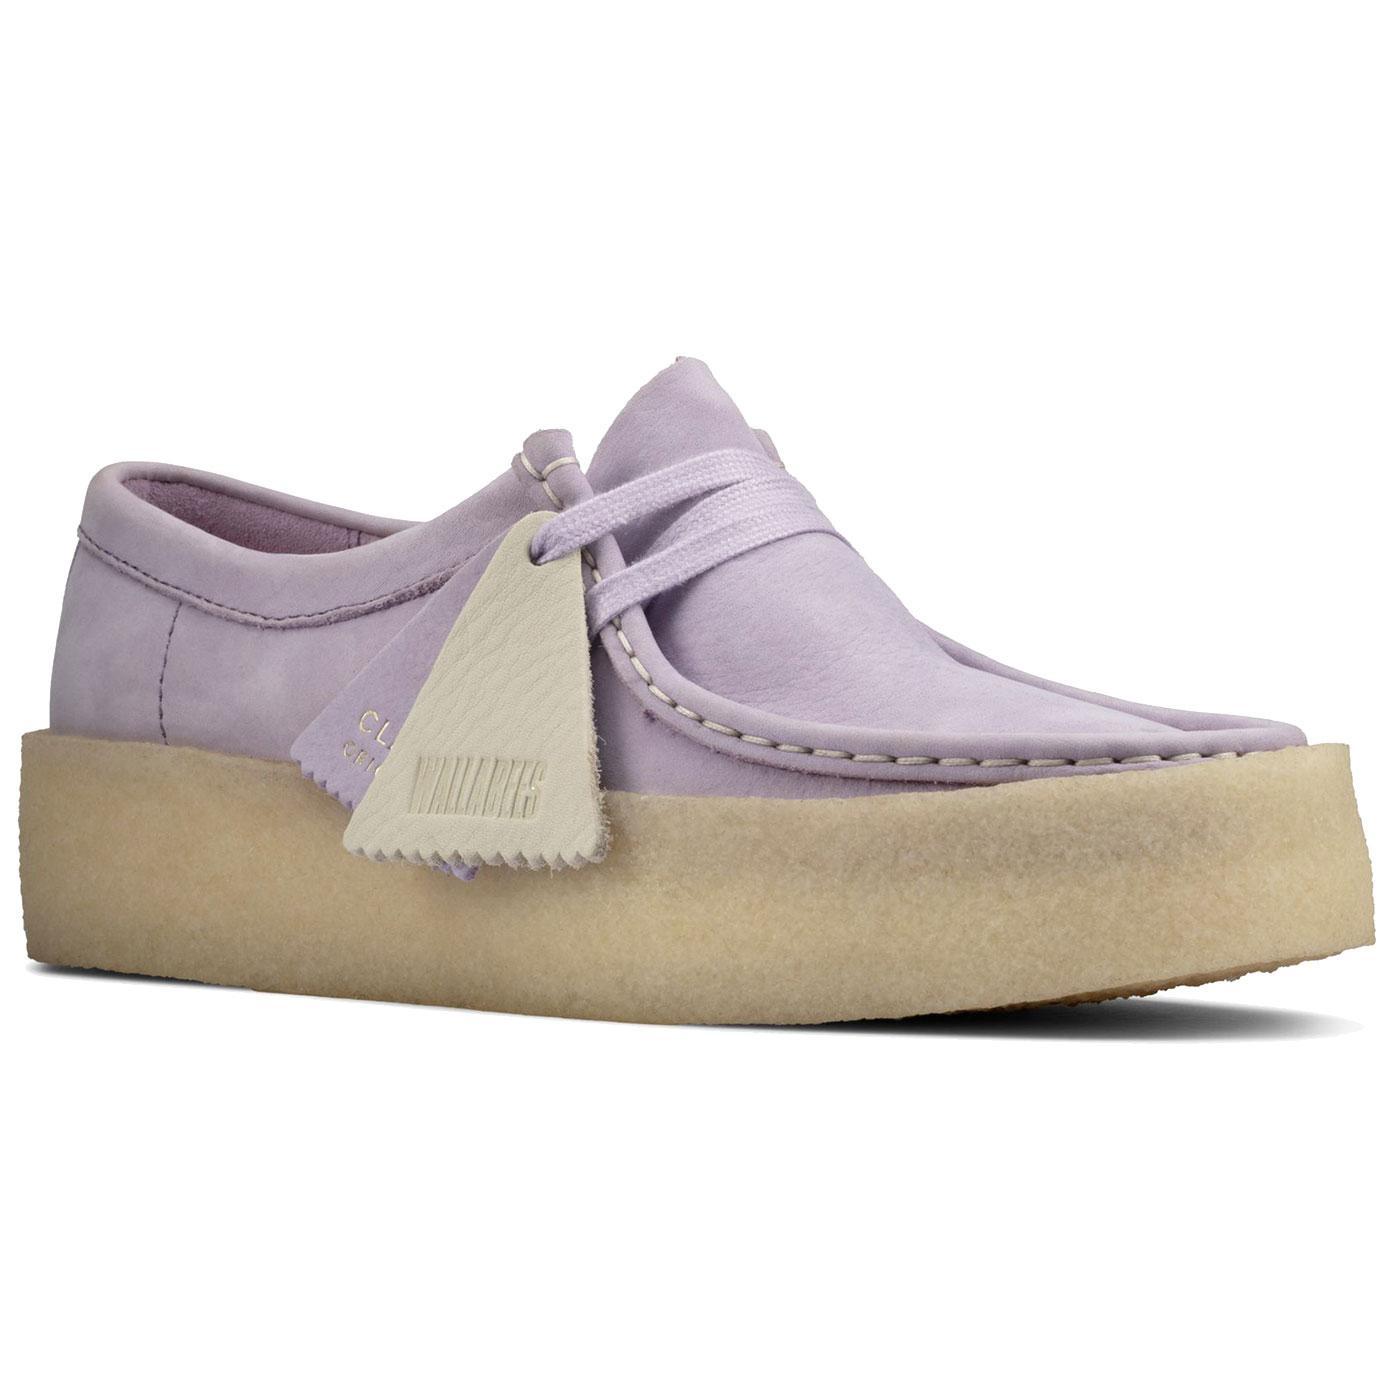 Wallabee Cup CLARKS ORIGINALS Womens Crepe Shoes L